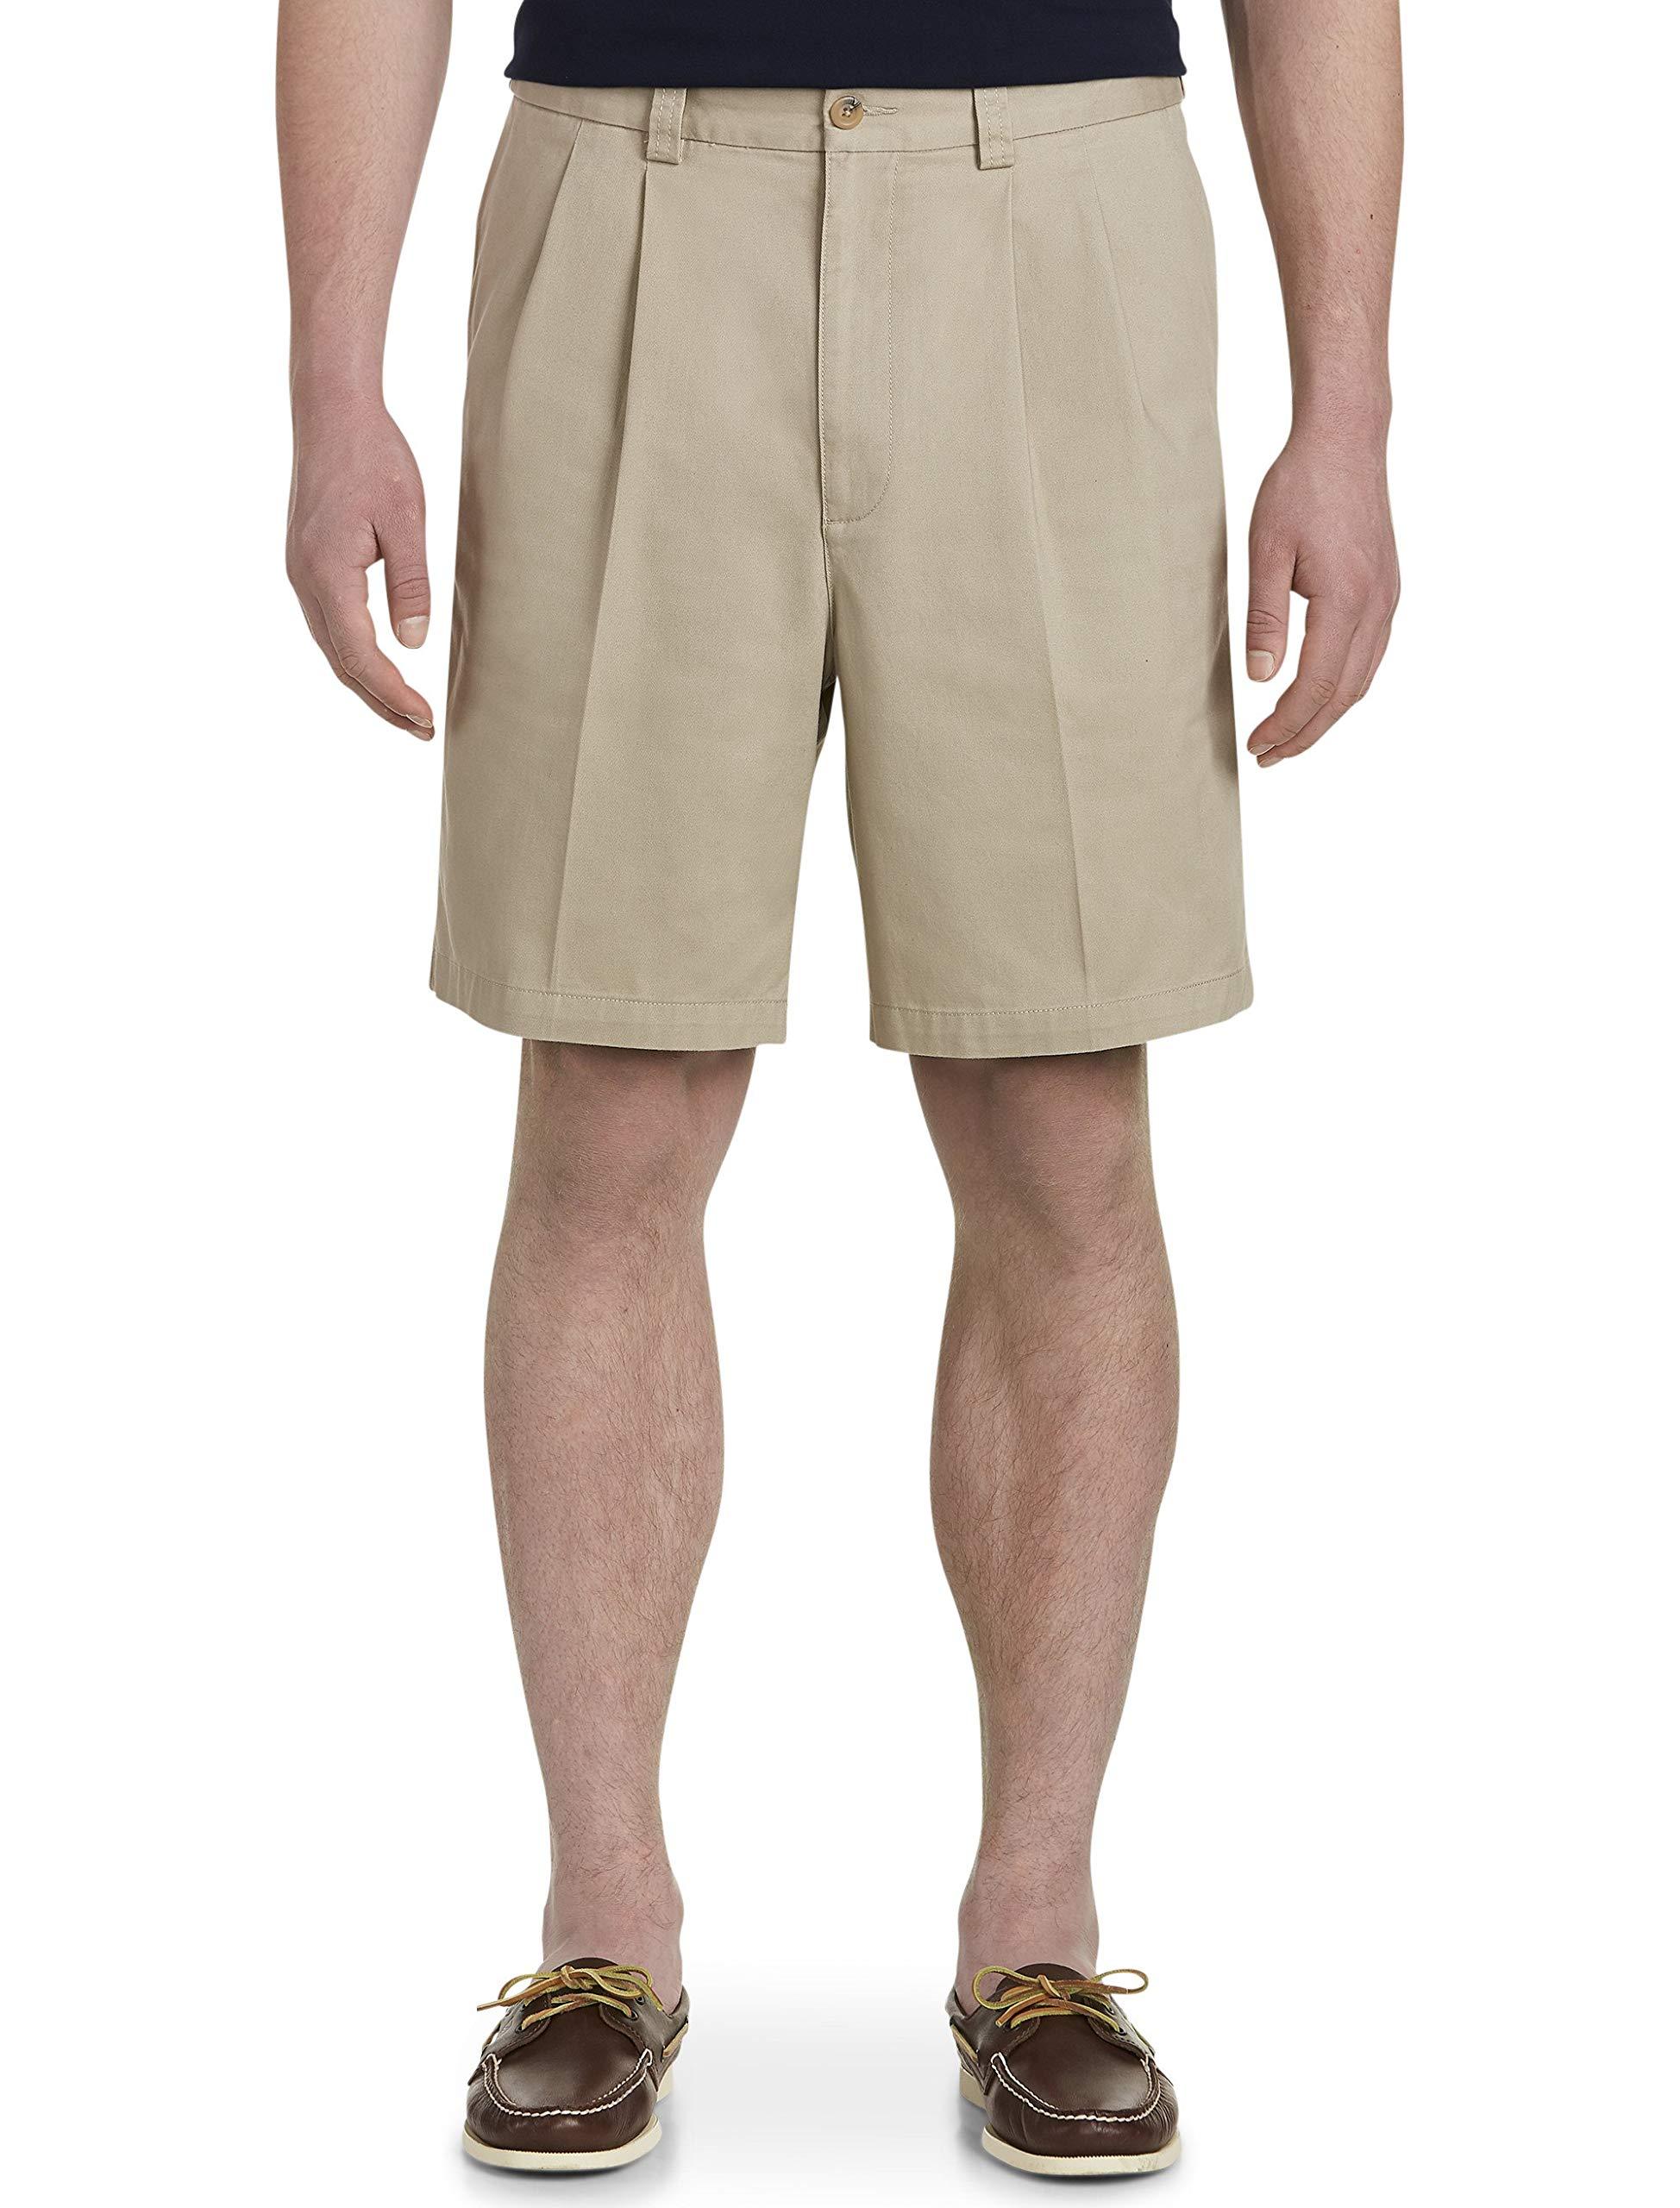 Harbor Bay by DXL Big and Tall Waist-Relaxer Pleated Twill Shorts, Khaki 44 Reg